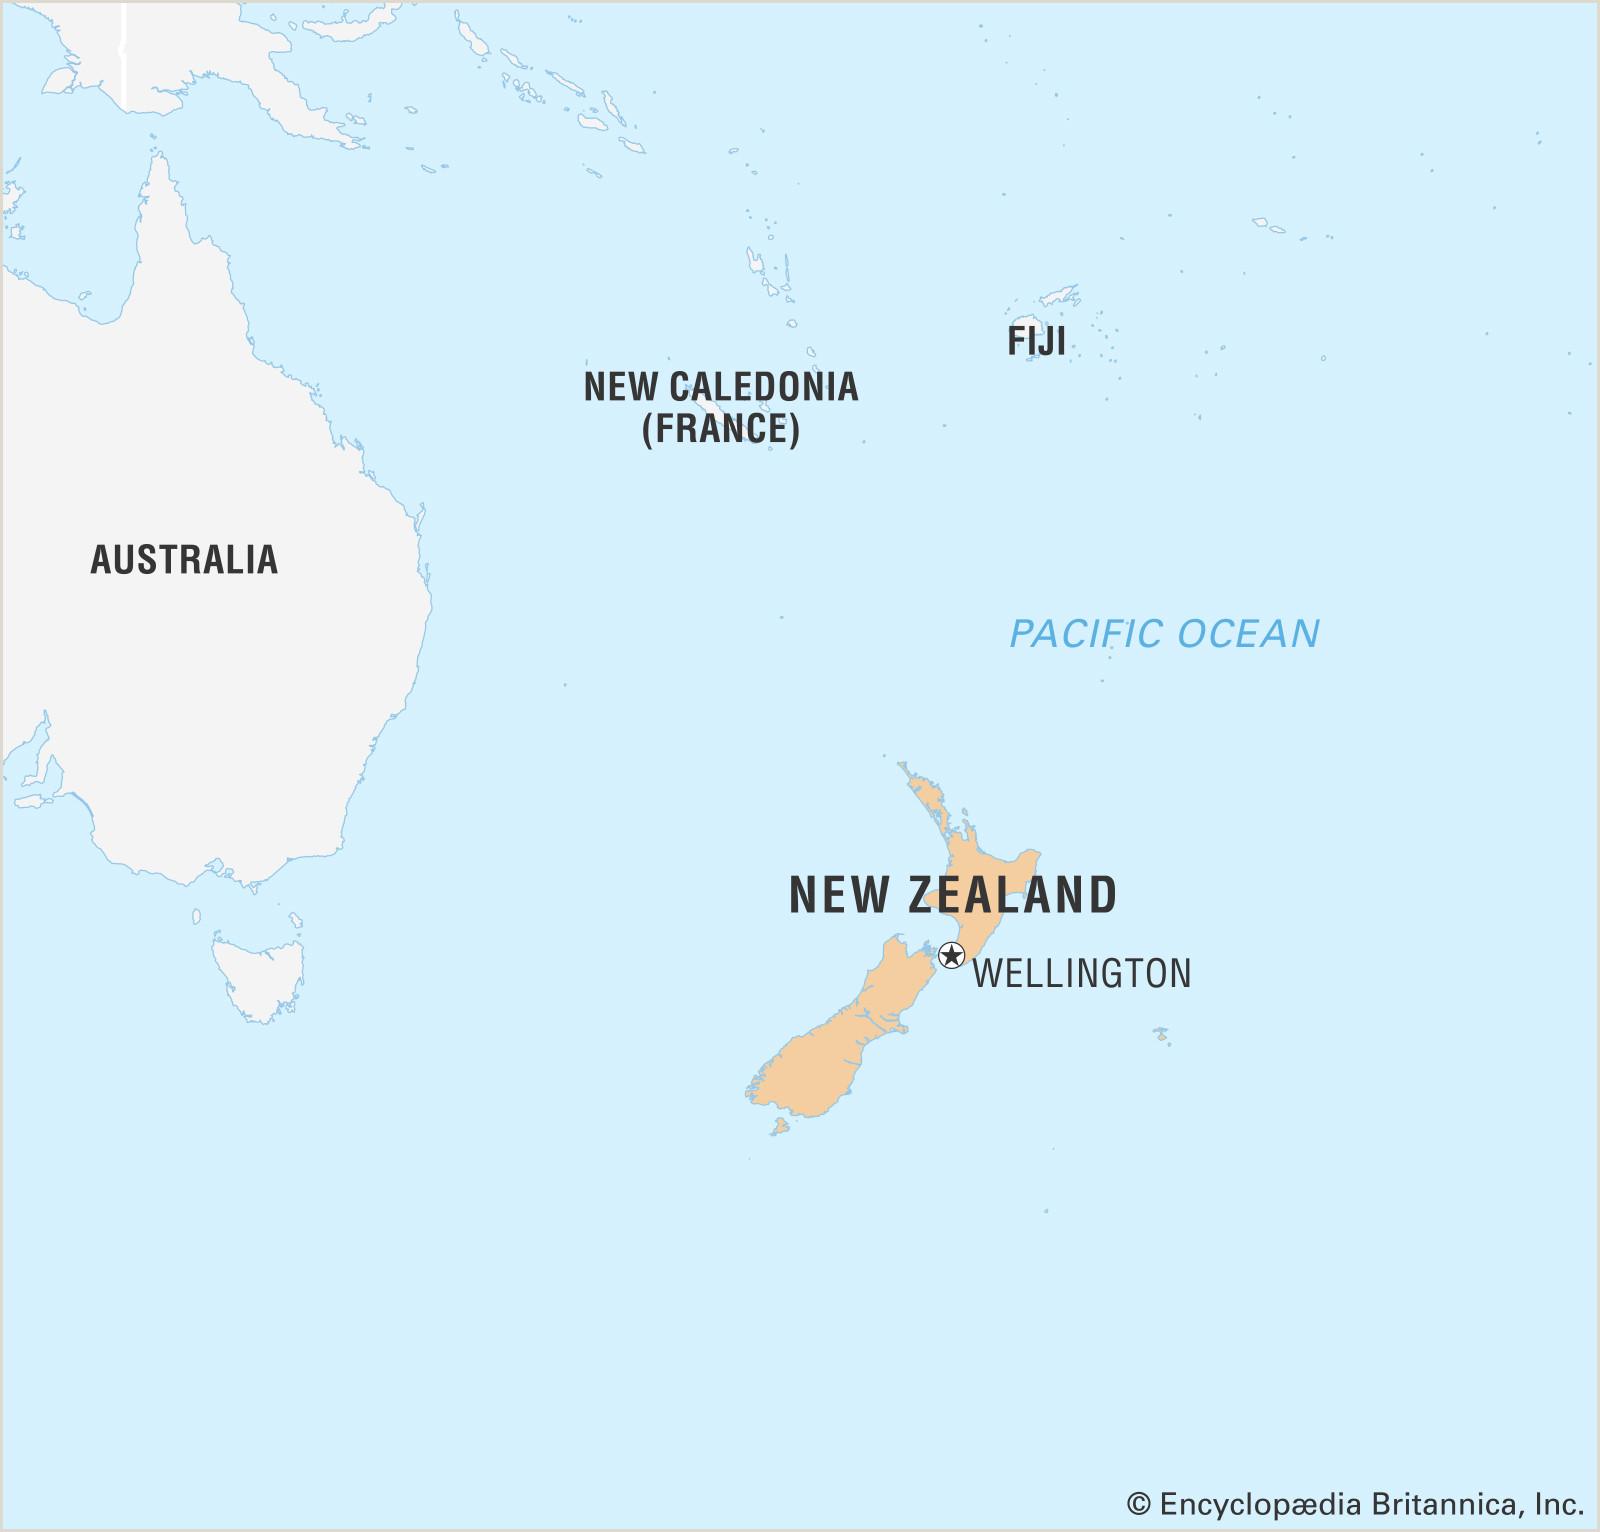 Standard Cv format In New Zealand New Zealand